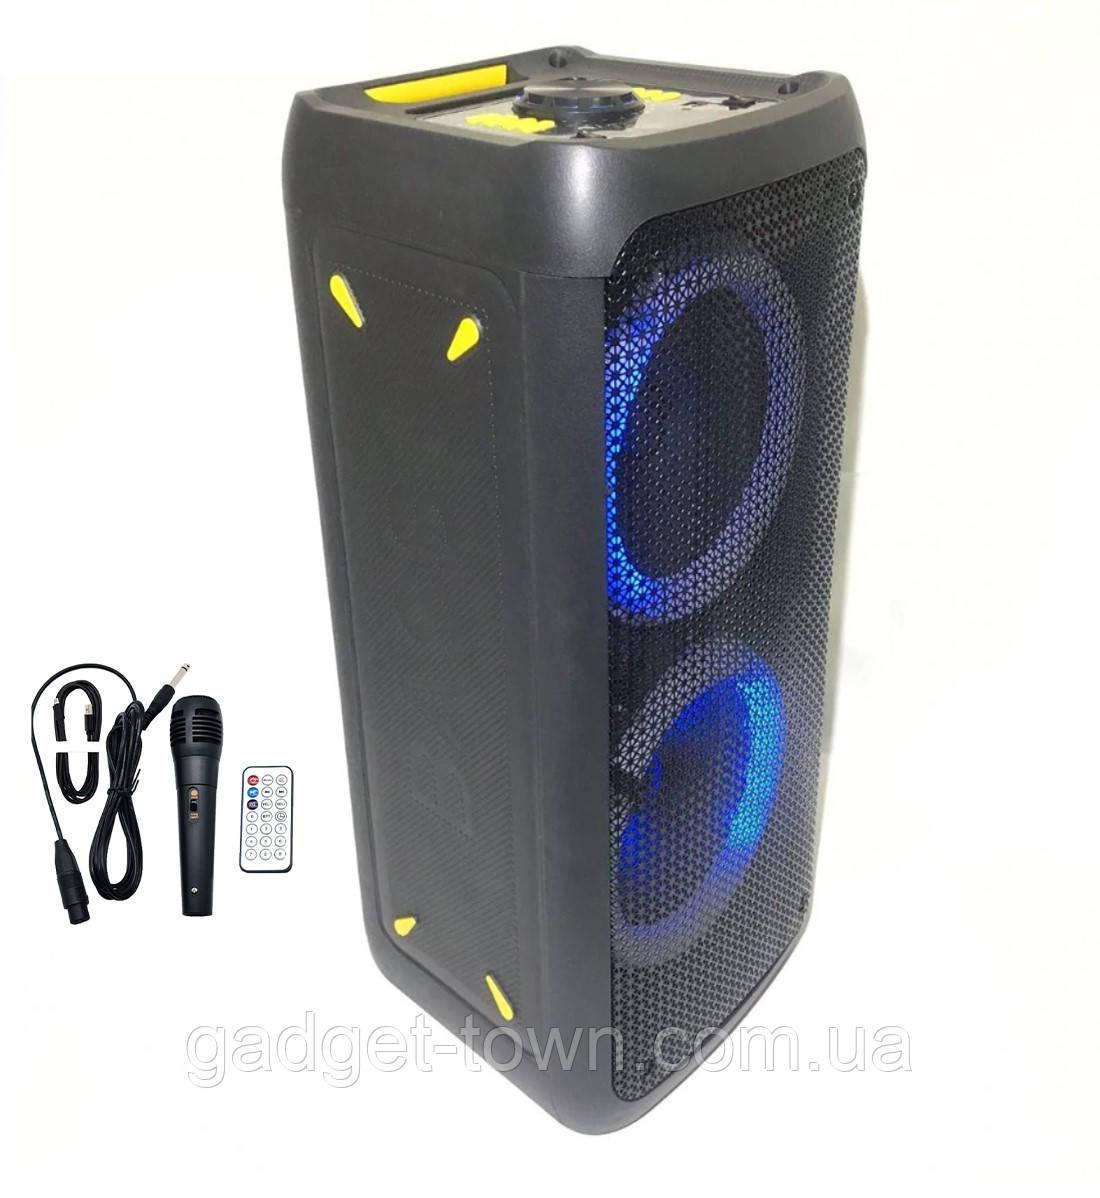 Колонка аккумуляторная DWQ partybox (80W/USB/BT/FM/TWS)